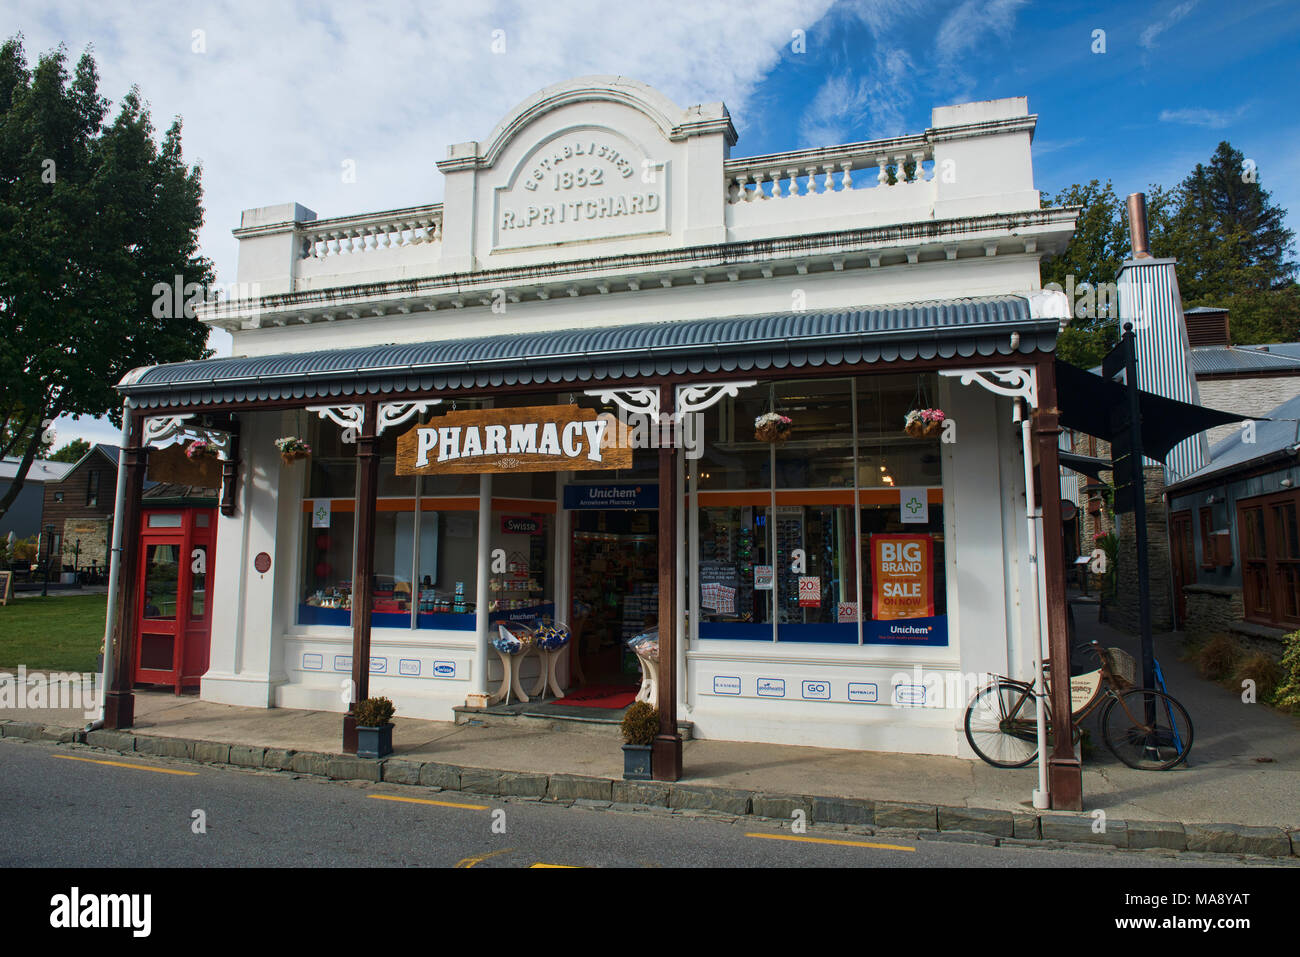 Old building in historic Arrowton, Otago, New Zealand Stock Photo